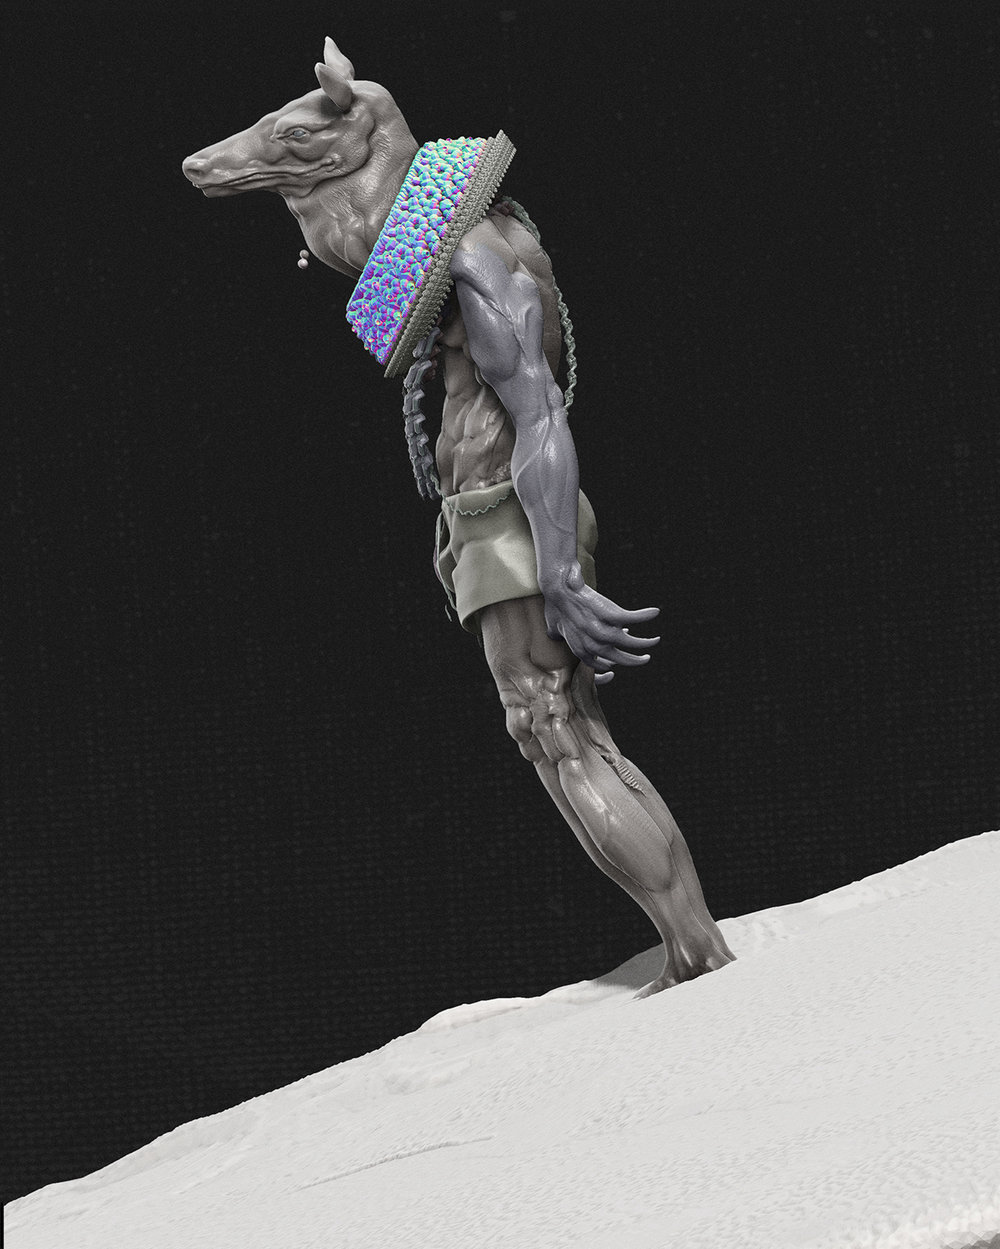 Max Brazier-Jones concept art minotaur character design